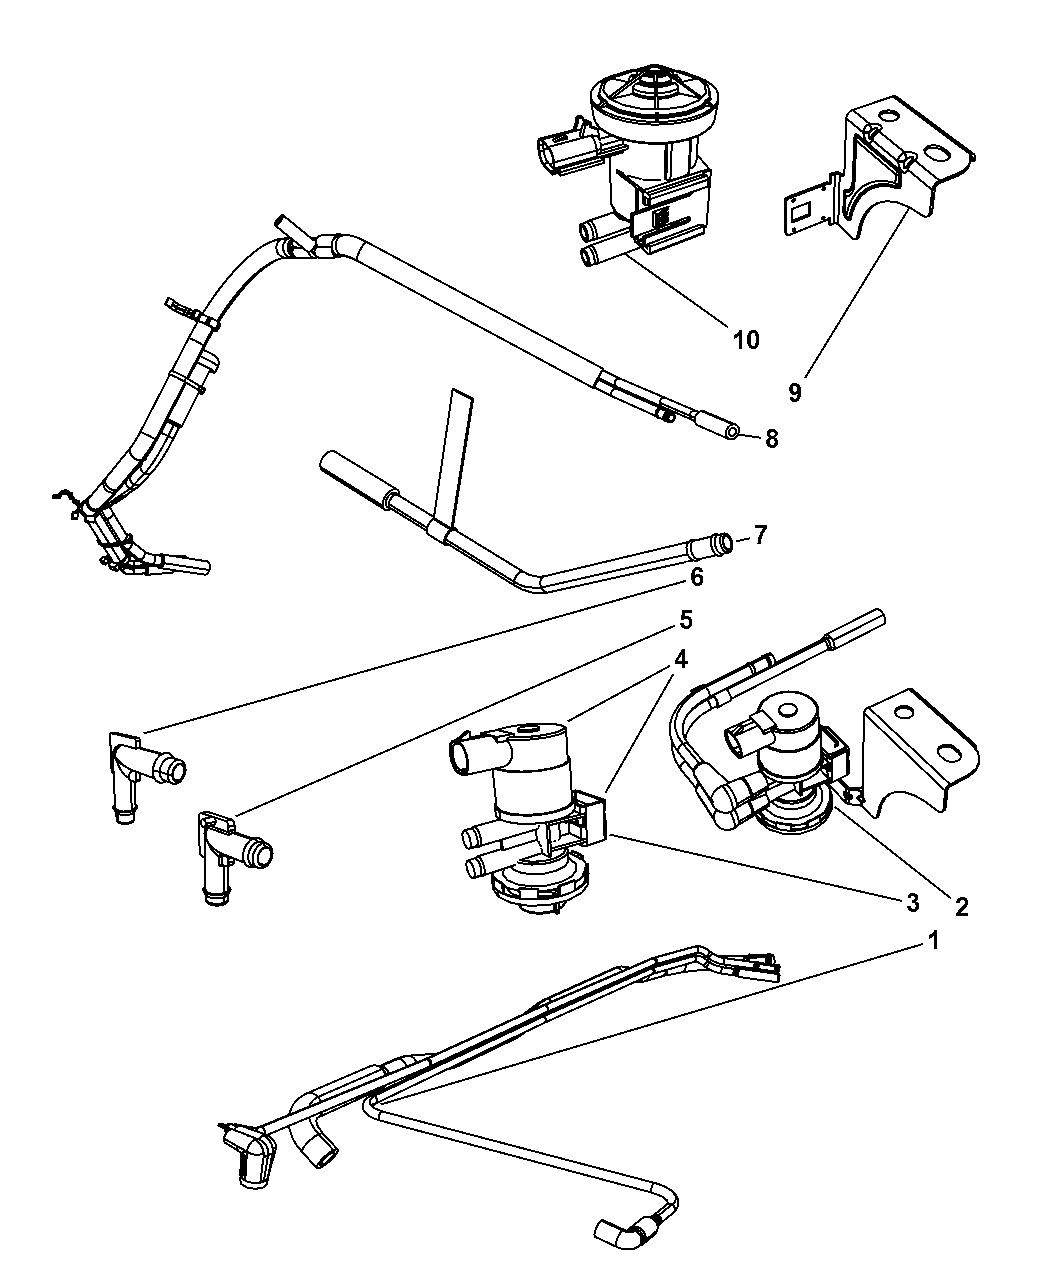 2003 Dodge Ram 1500 Emission Control Vacuum Harness